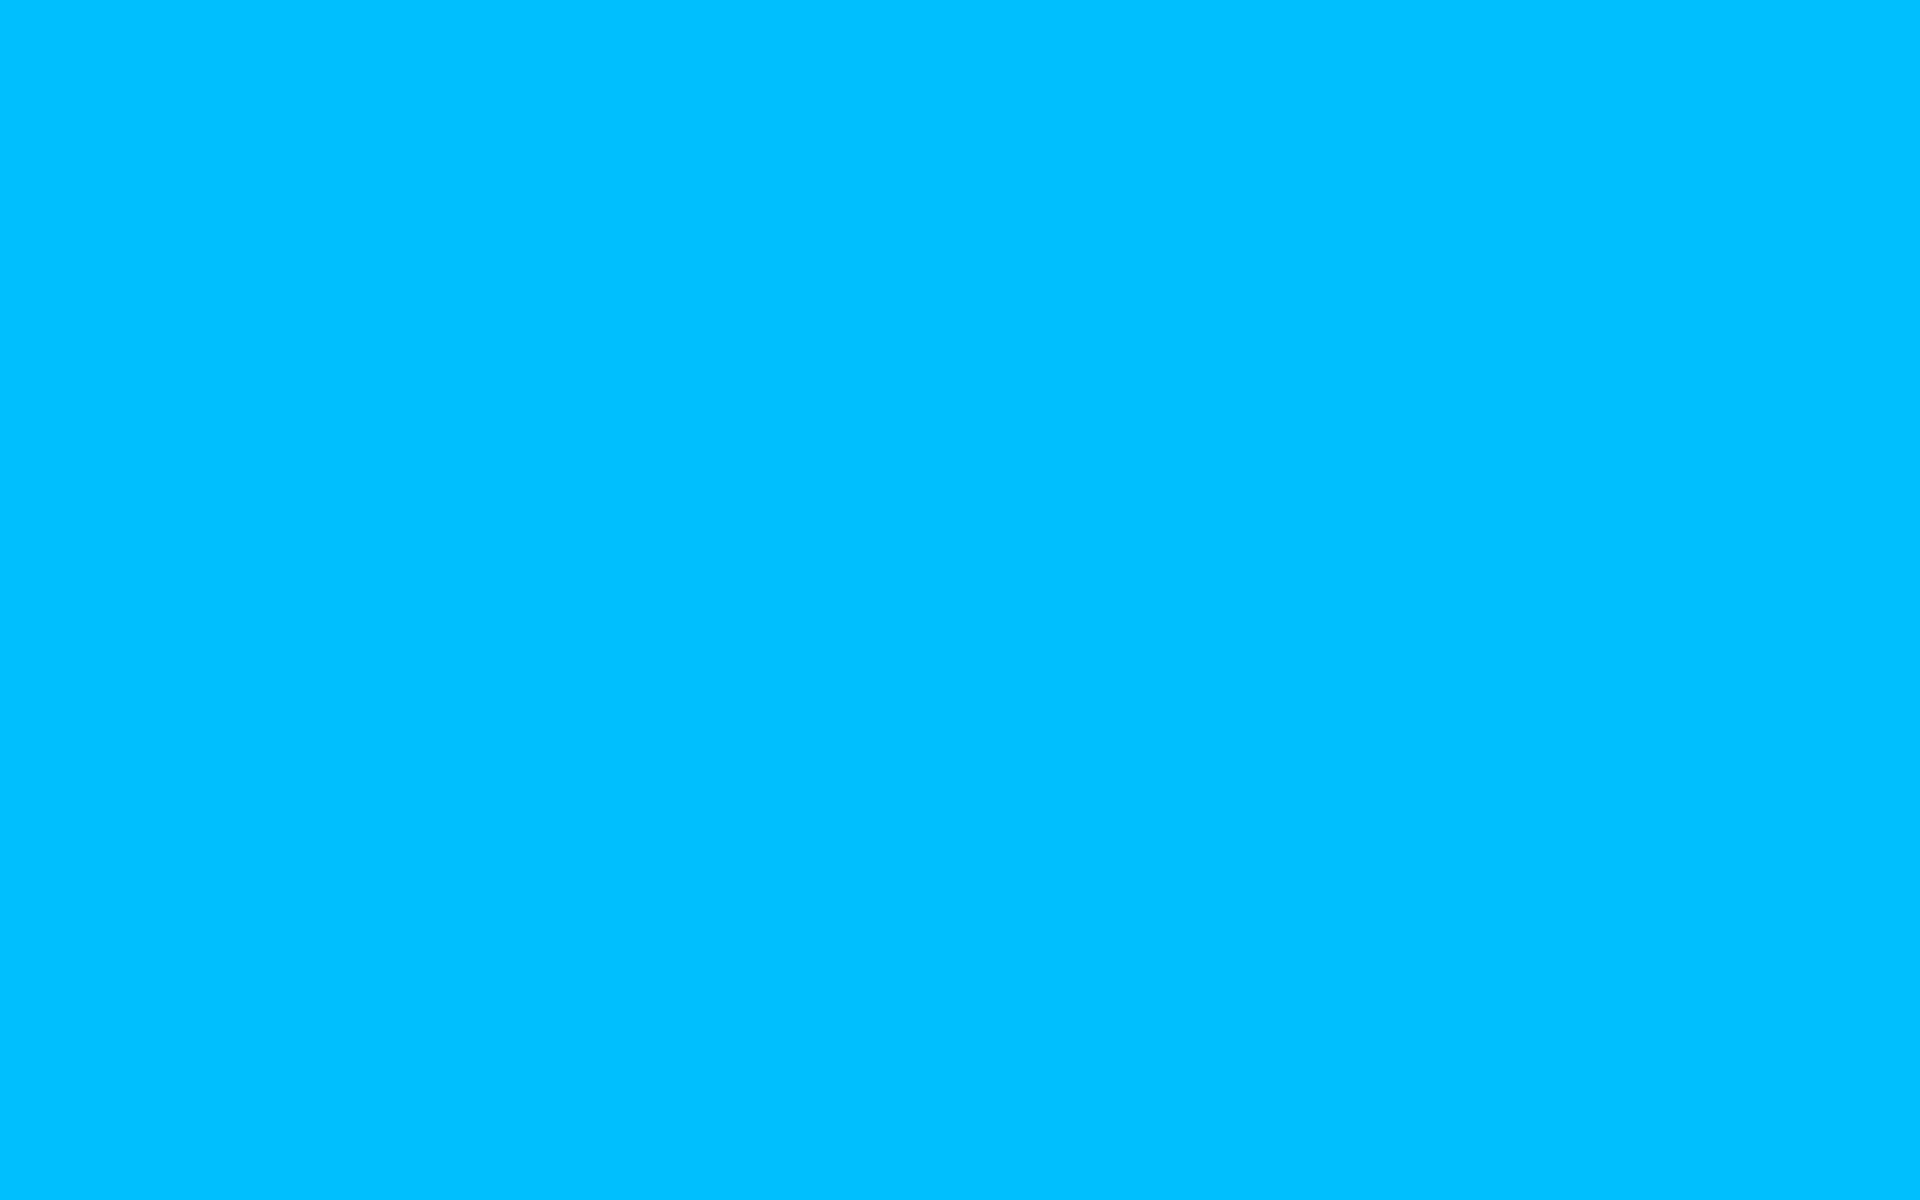 1920x1200 Deep Sky Blue Solid Color Background